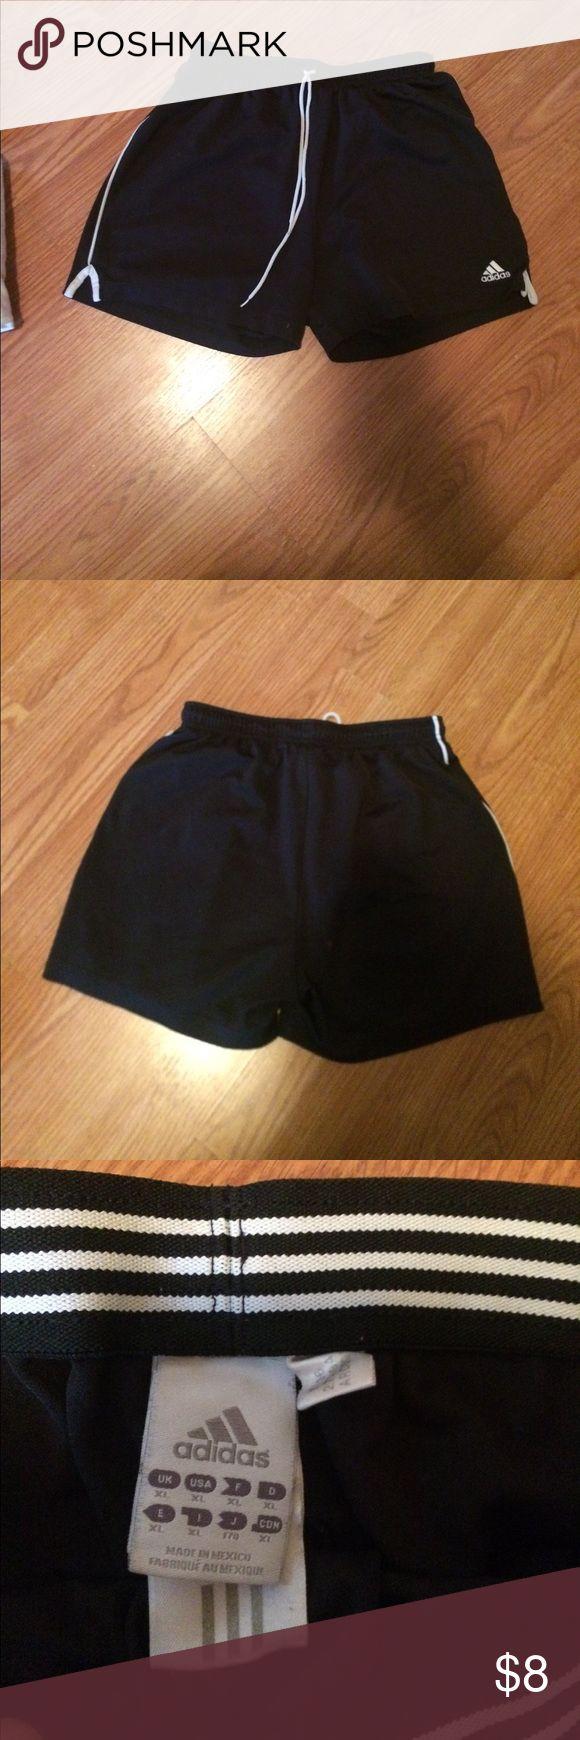 Adidas soccer shorts Kids XL but fit an adult small adidas Bottoms Shorts